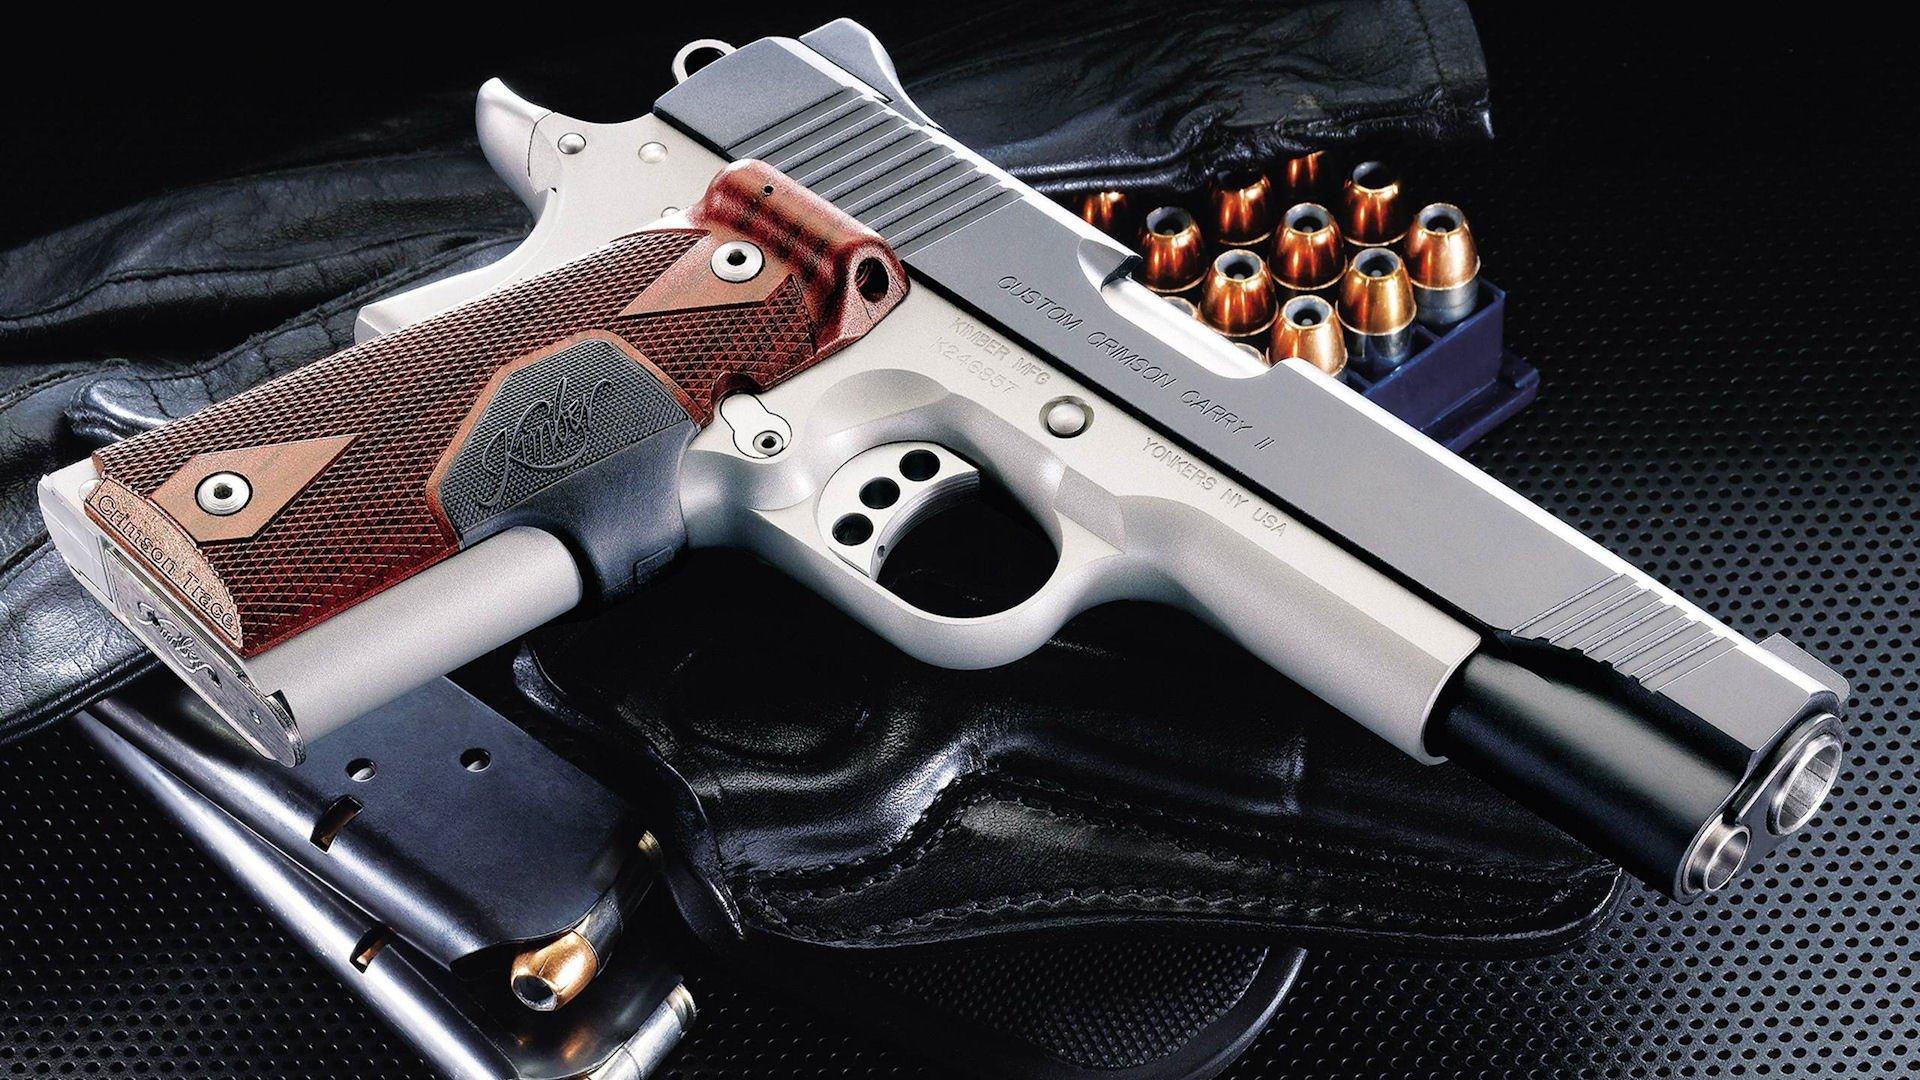 1920x1080 > Kimber Pistol Wallpapers